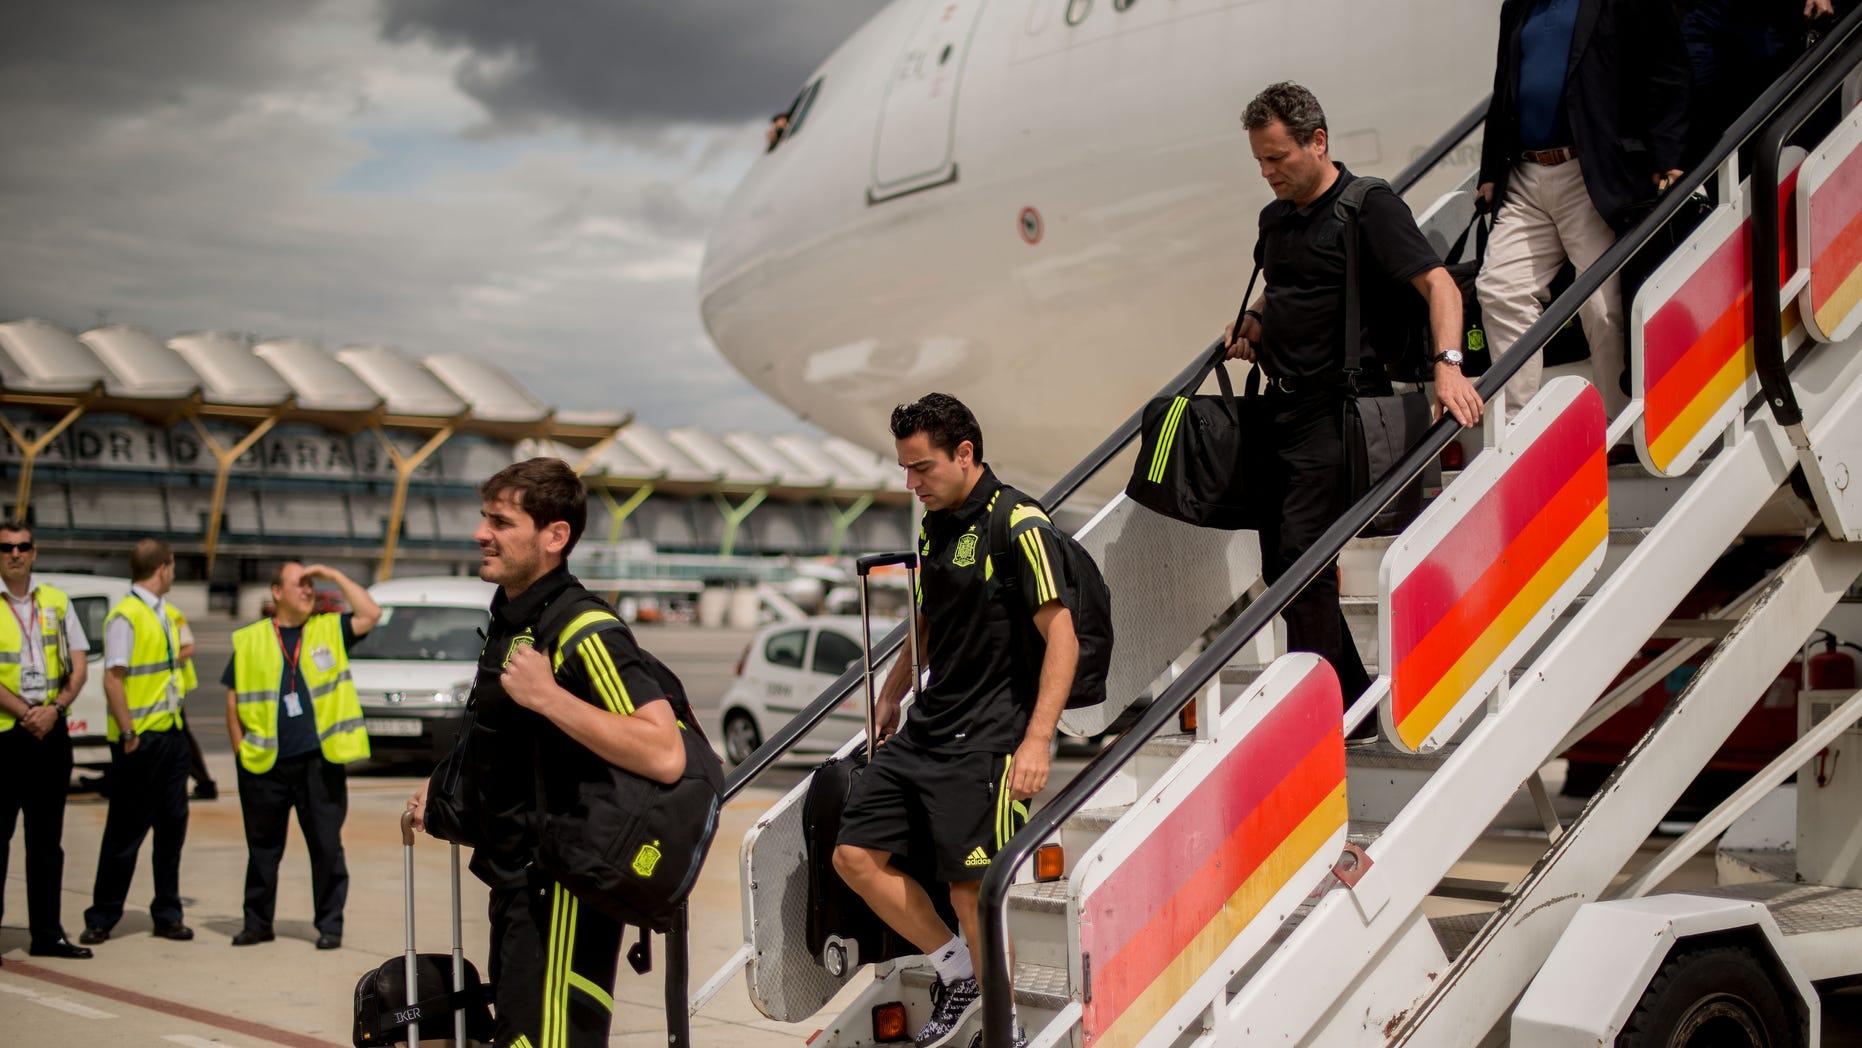 Iker Casillas (L) and Xavi Hernandez of Spain arrive at Barajas-Adolfo Suarez Airport on June 24, 2014 in Madrid, Spain.